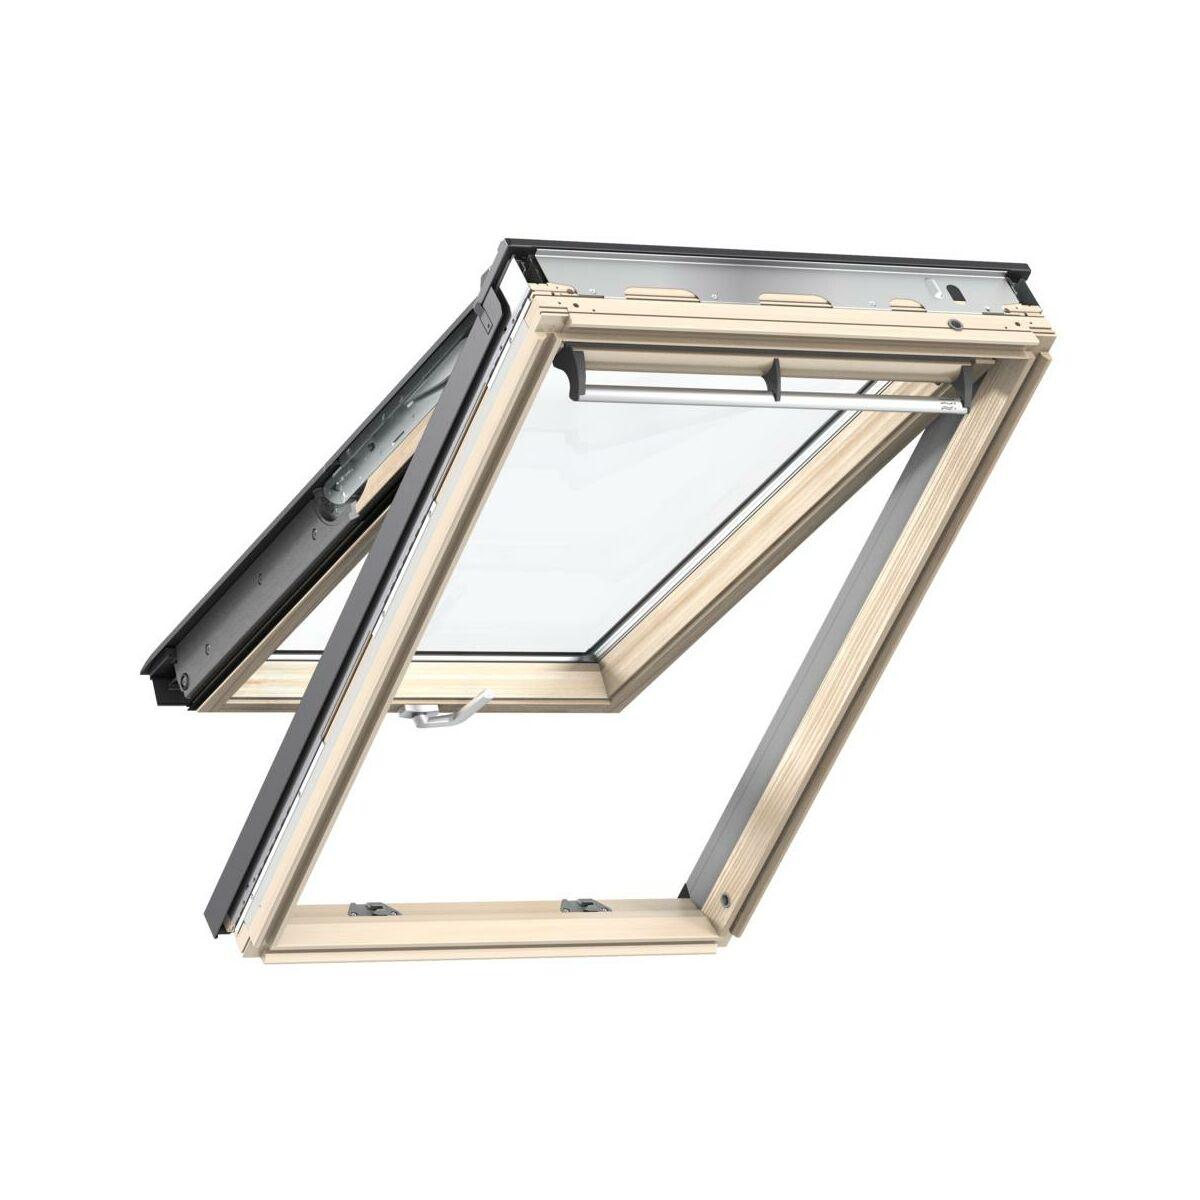 Okno dachowe gpl pk06 3066 velux okna dachowe w for Moustiquaire velux leroy merlin